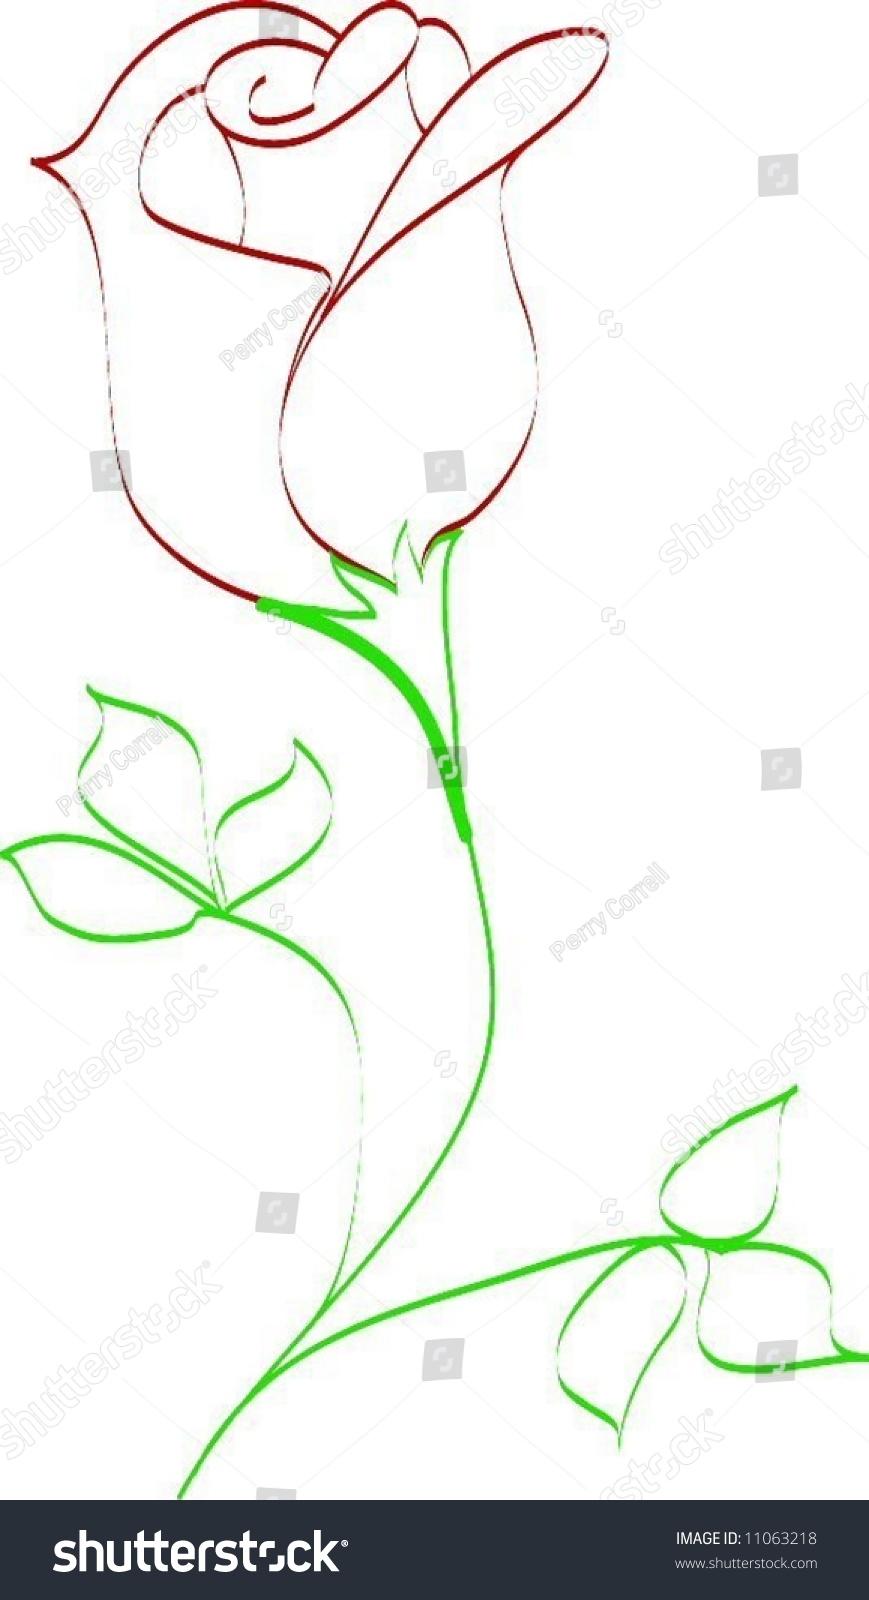 Simple Vector Line Art : Simple line drawing rose bud stock vector